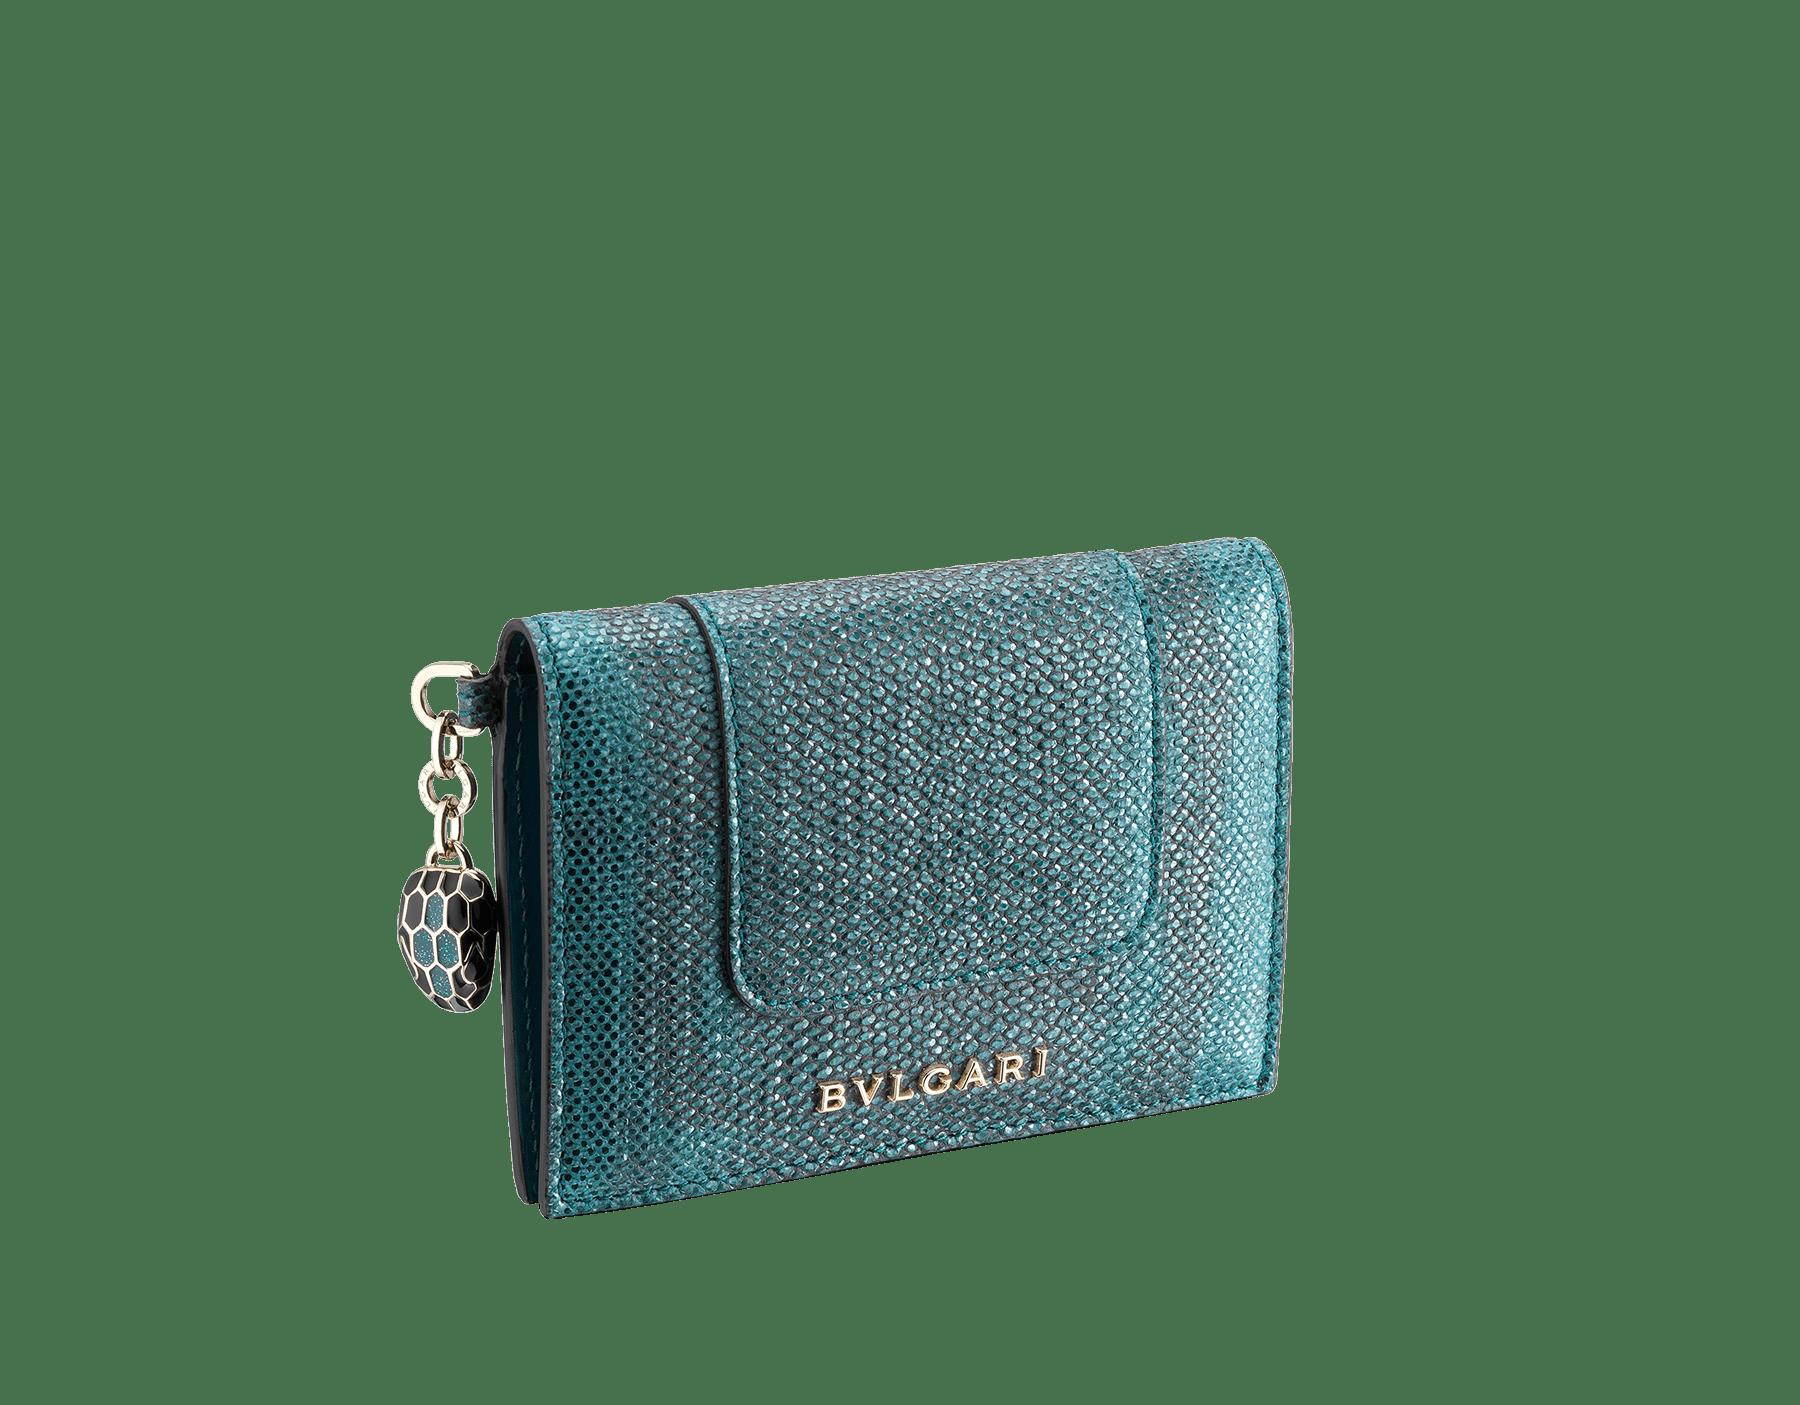 Serpenti Forever folded credit card holder in deep jade metallic karung skin. Iconic snakehead charm in black and glitter deep jade enamel, with black enamel eyes. 288073 image 1